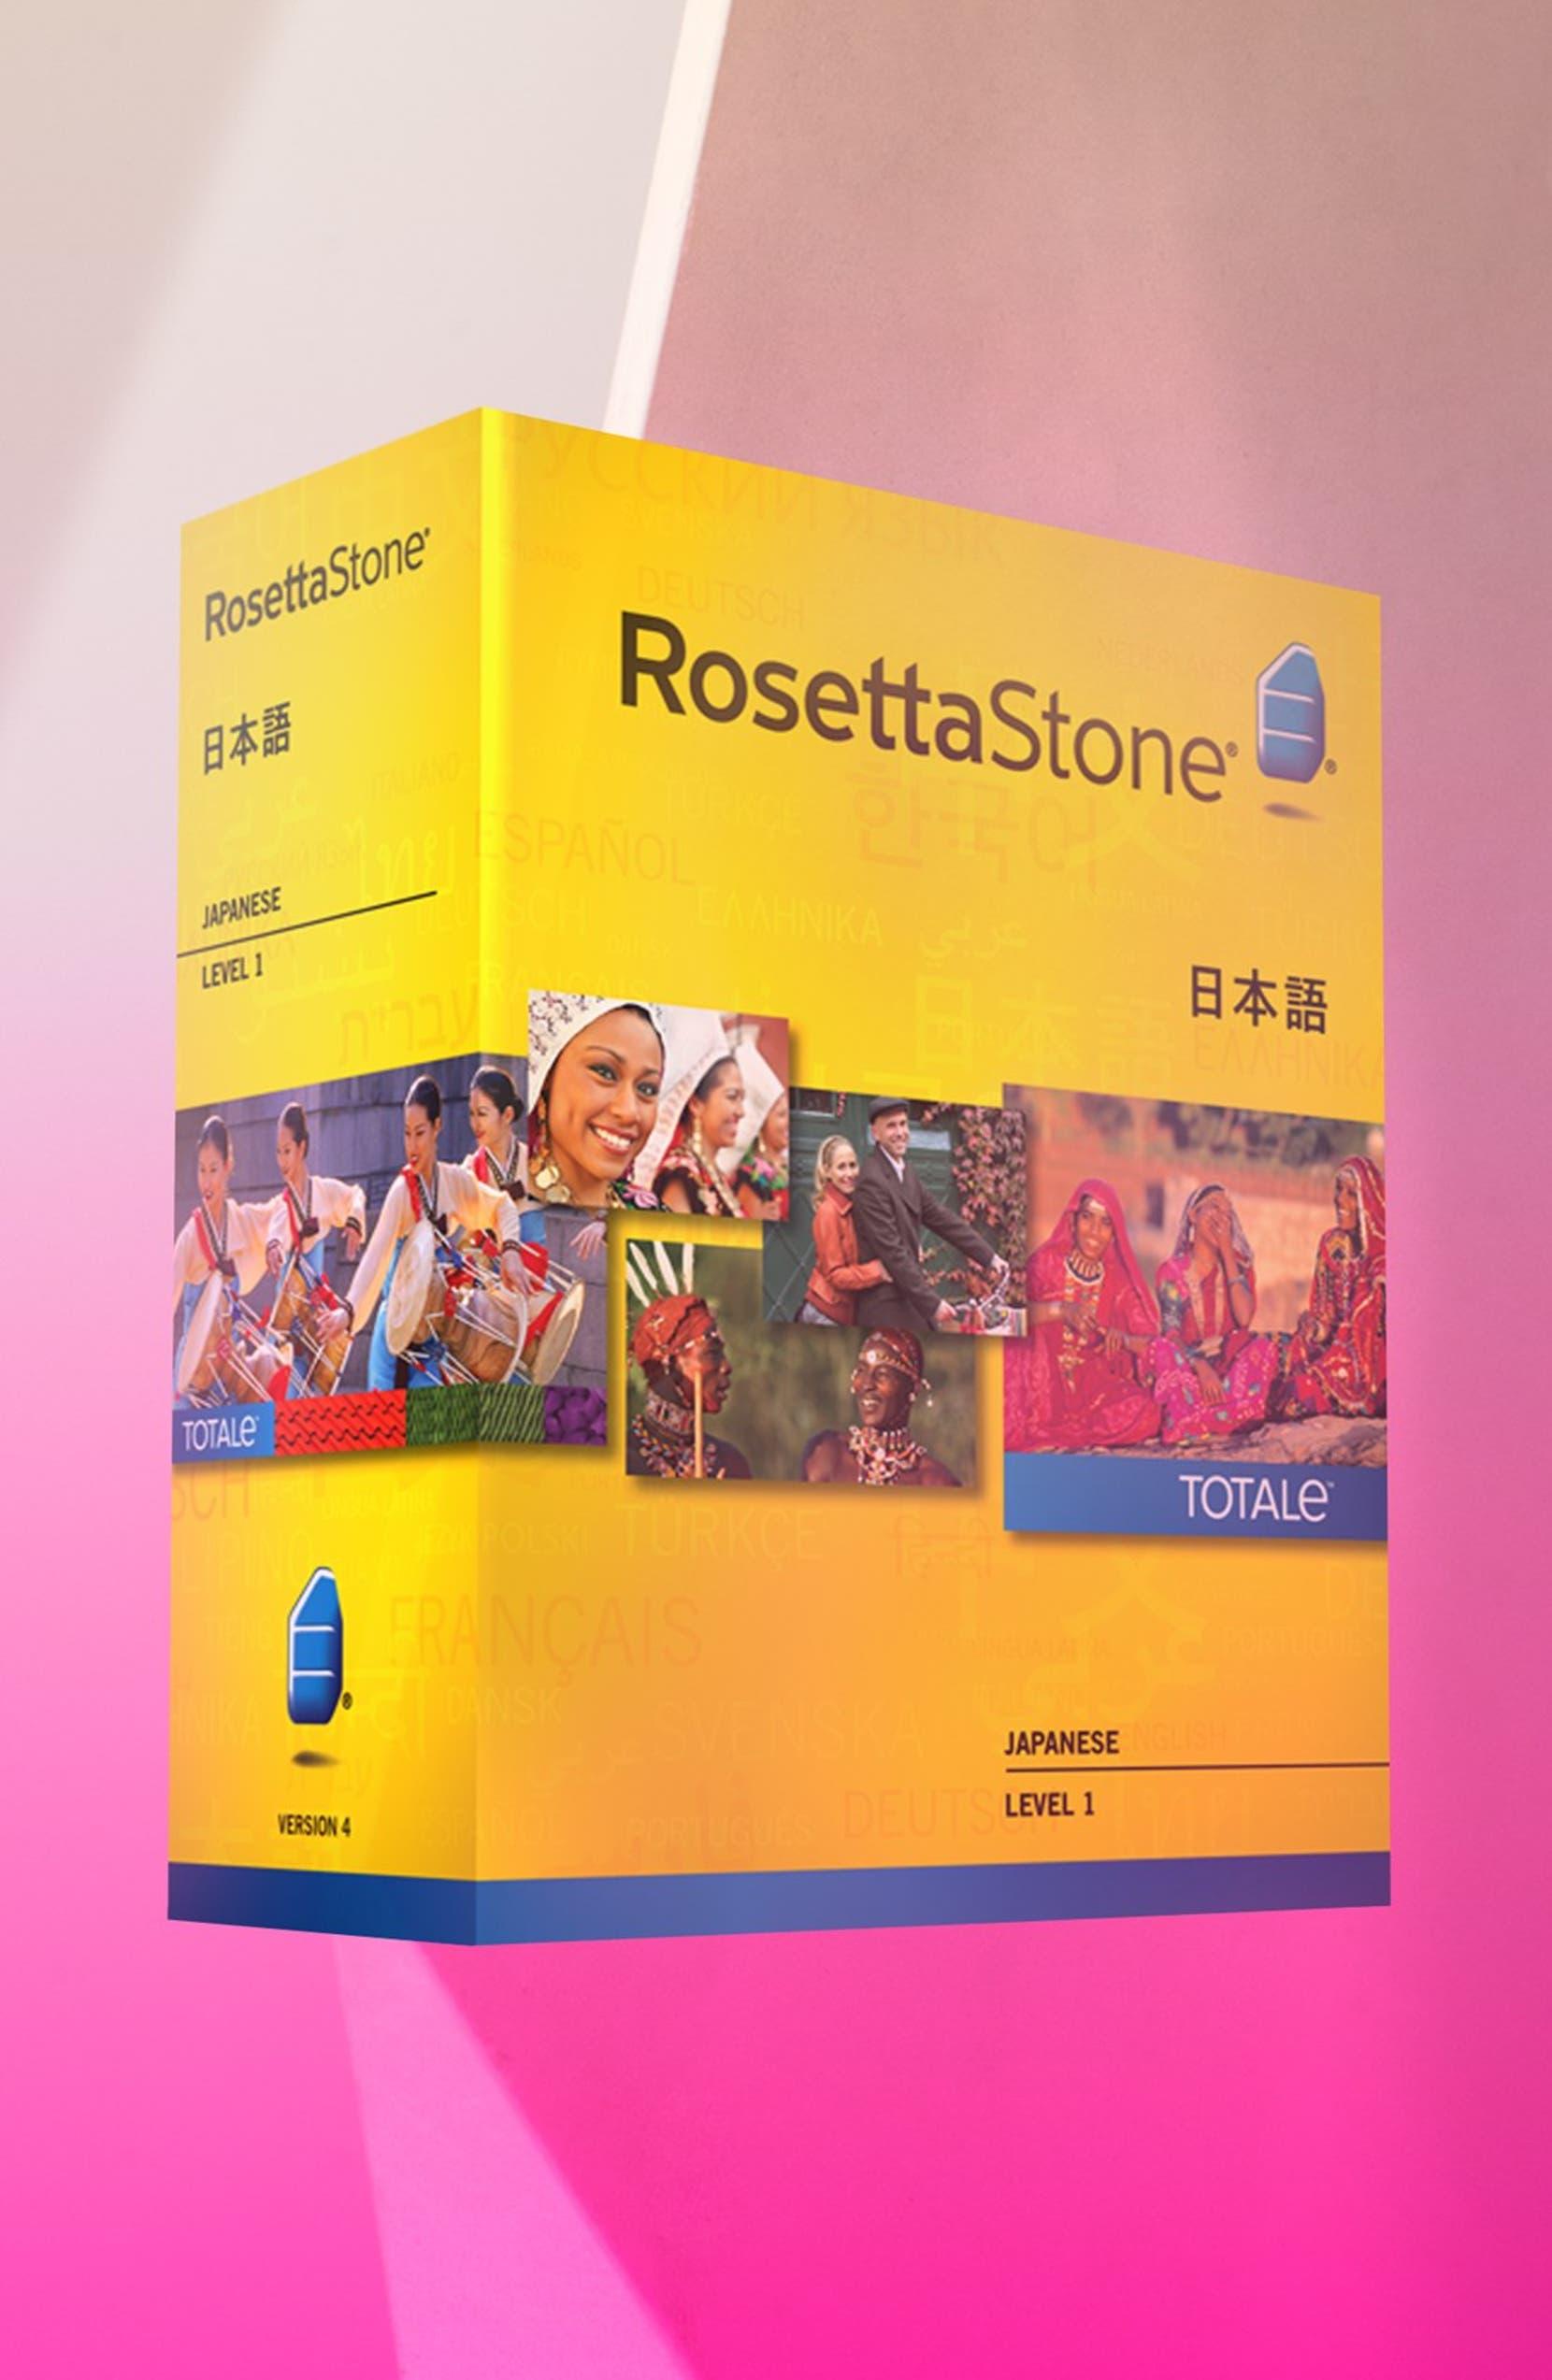 Rosetta Stone 'Japanese Level 1' Interactive Language